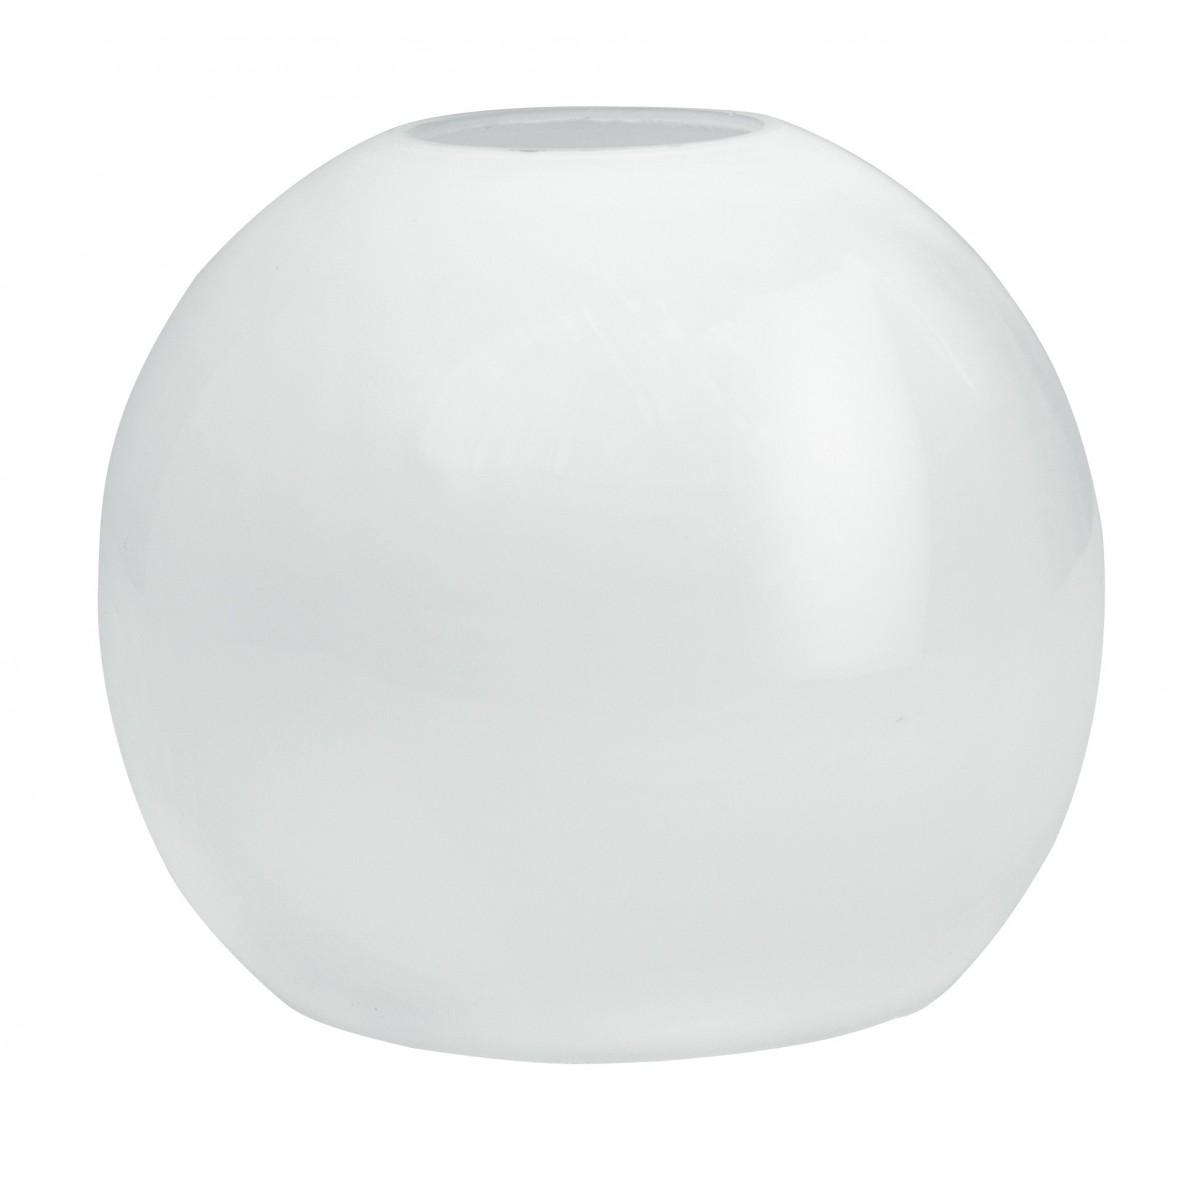 I-VLUPI - Paralume Tondo Vetro Bianco